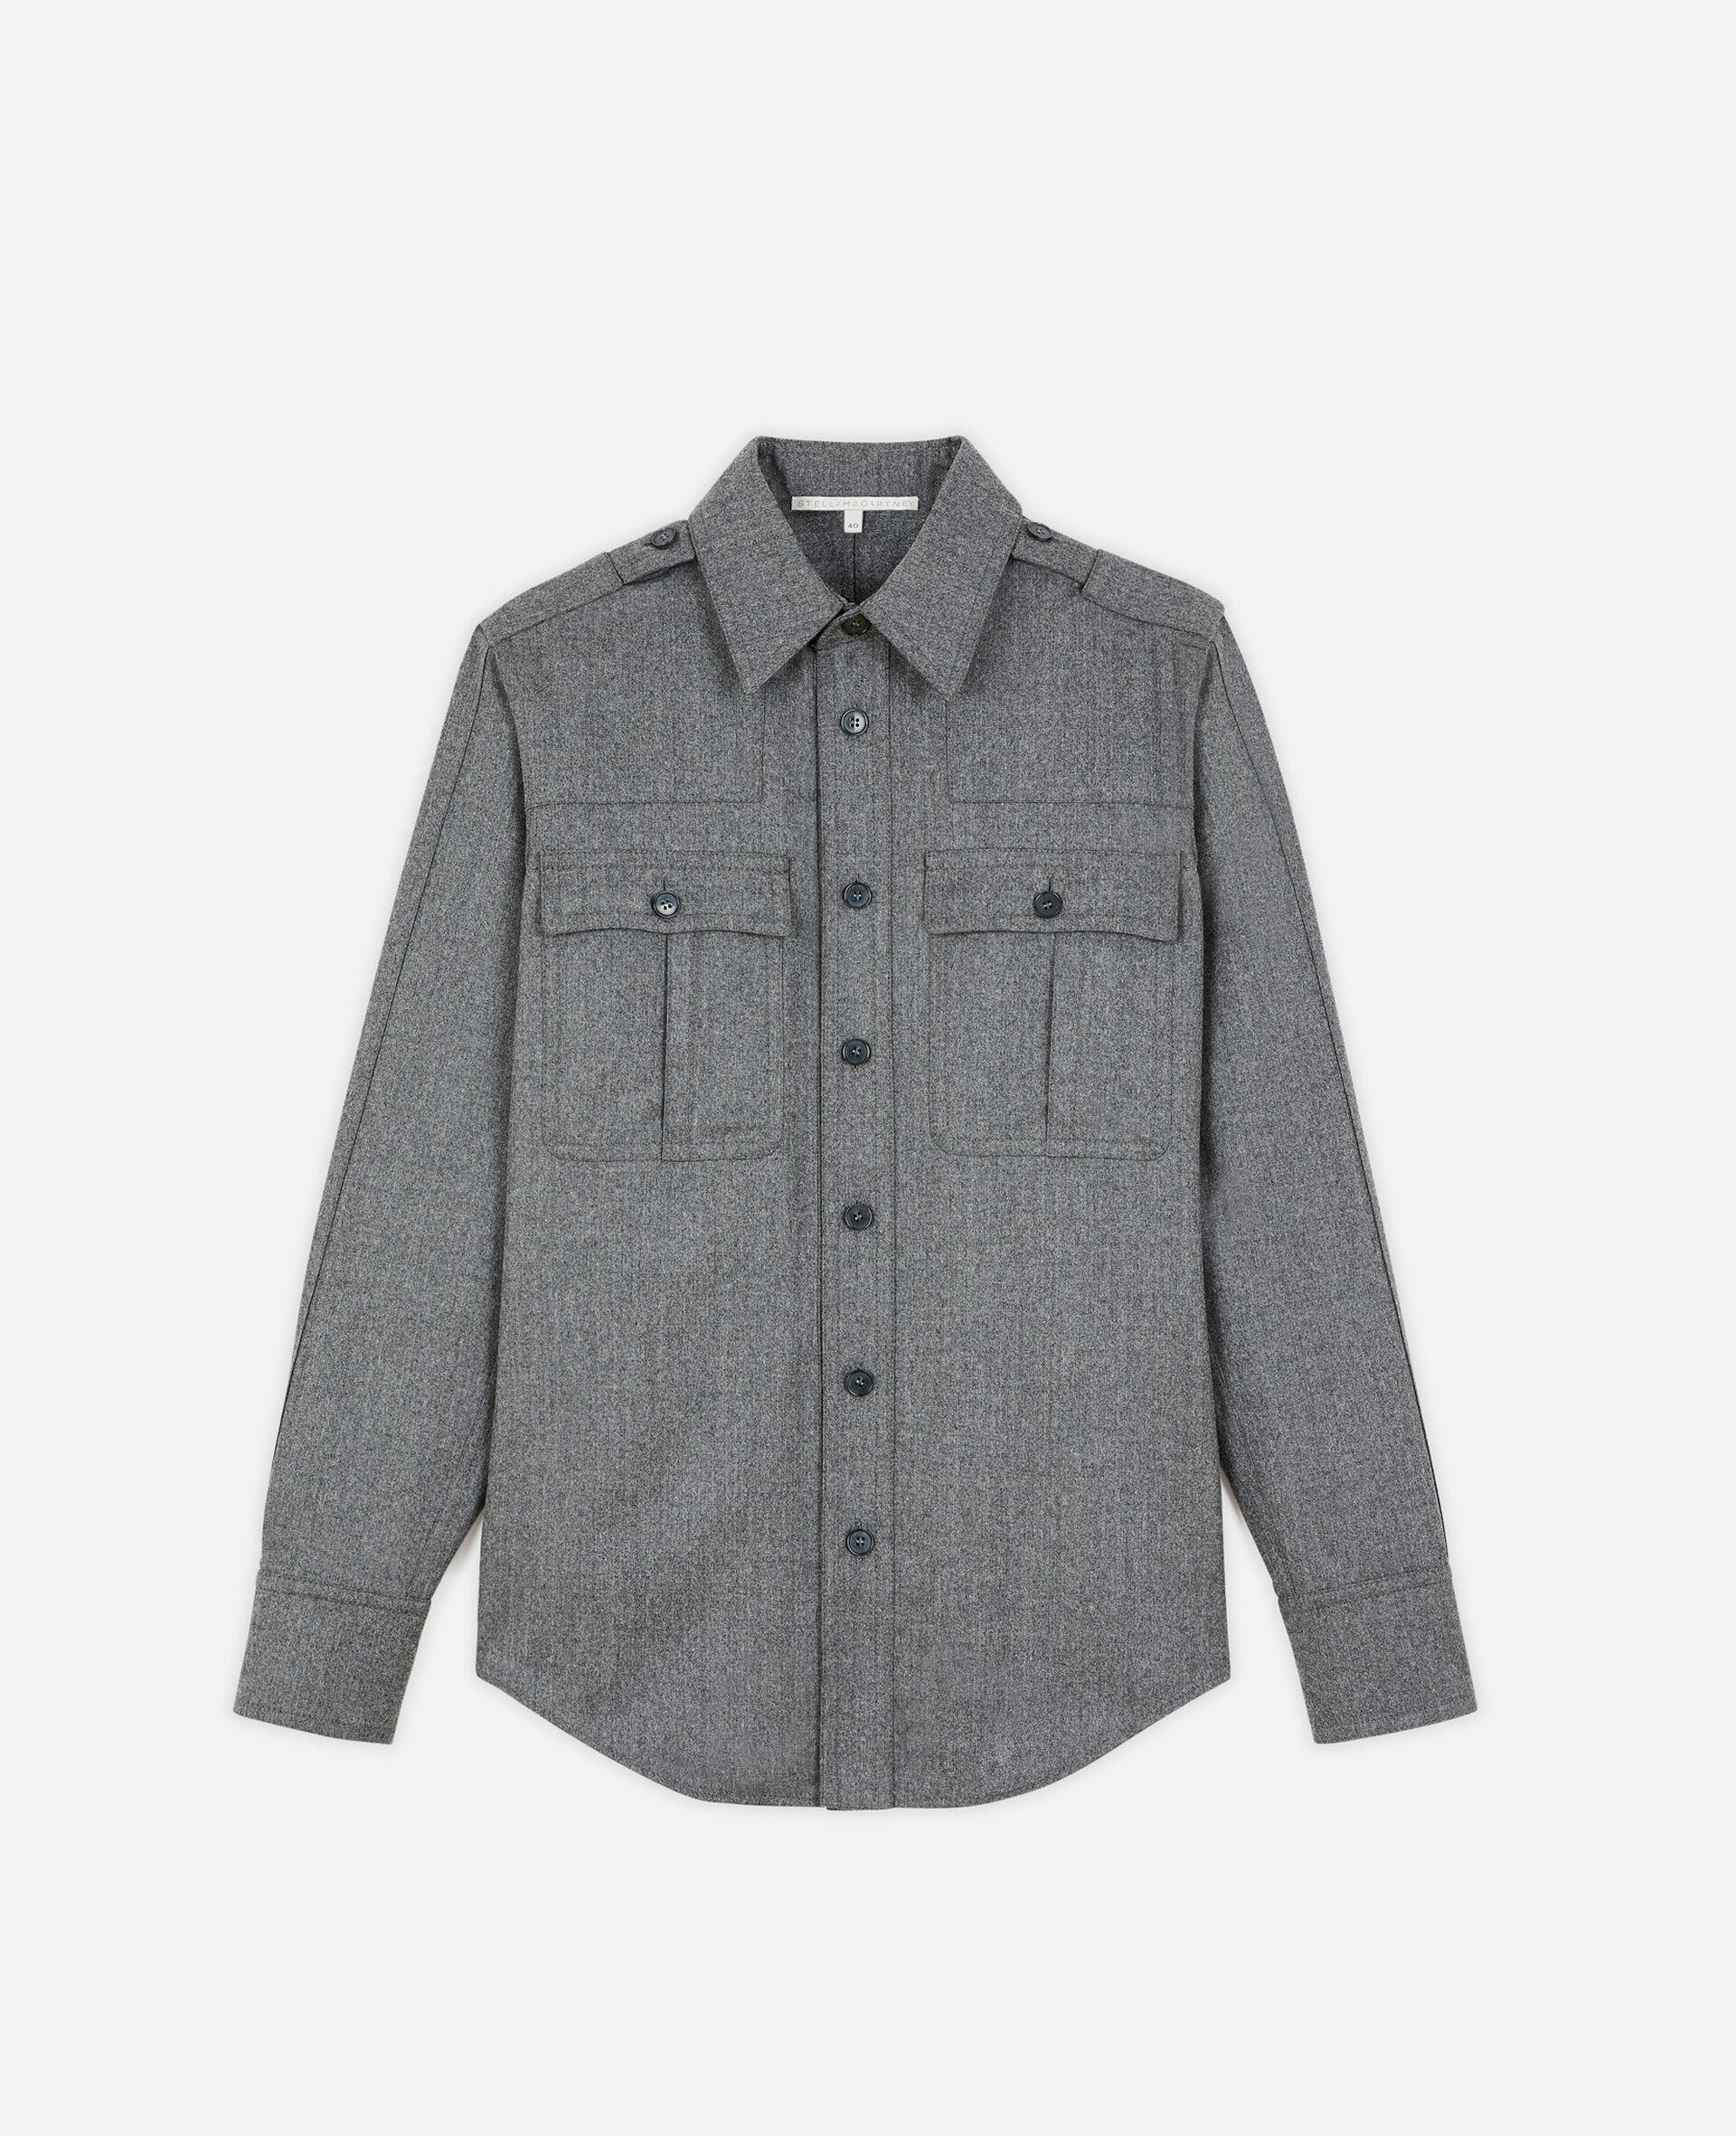 Wool Flannel Shirt-Grau-large image number 0